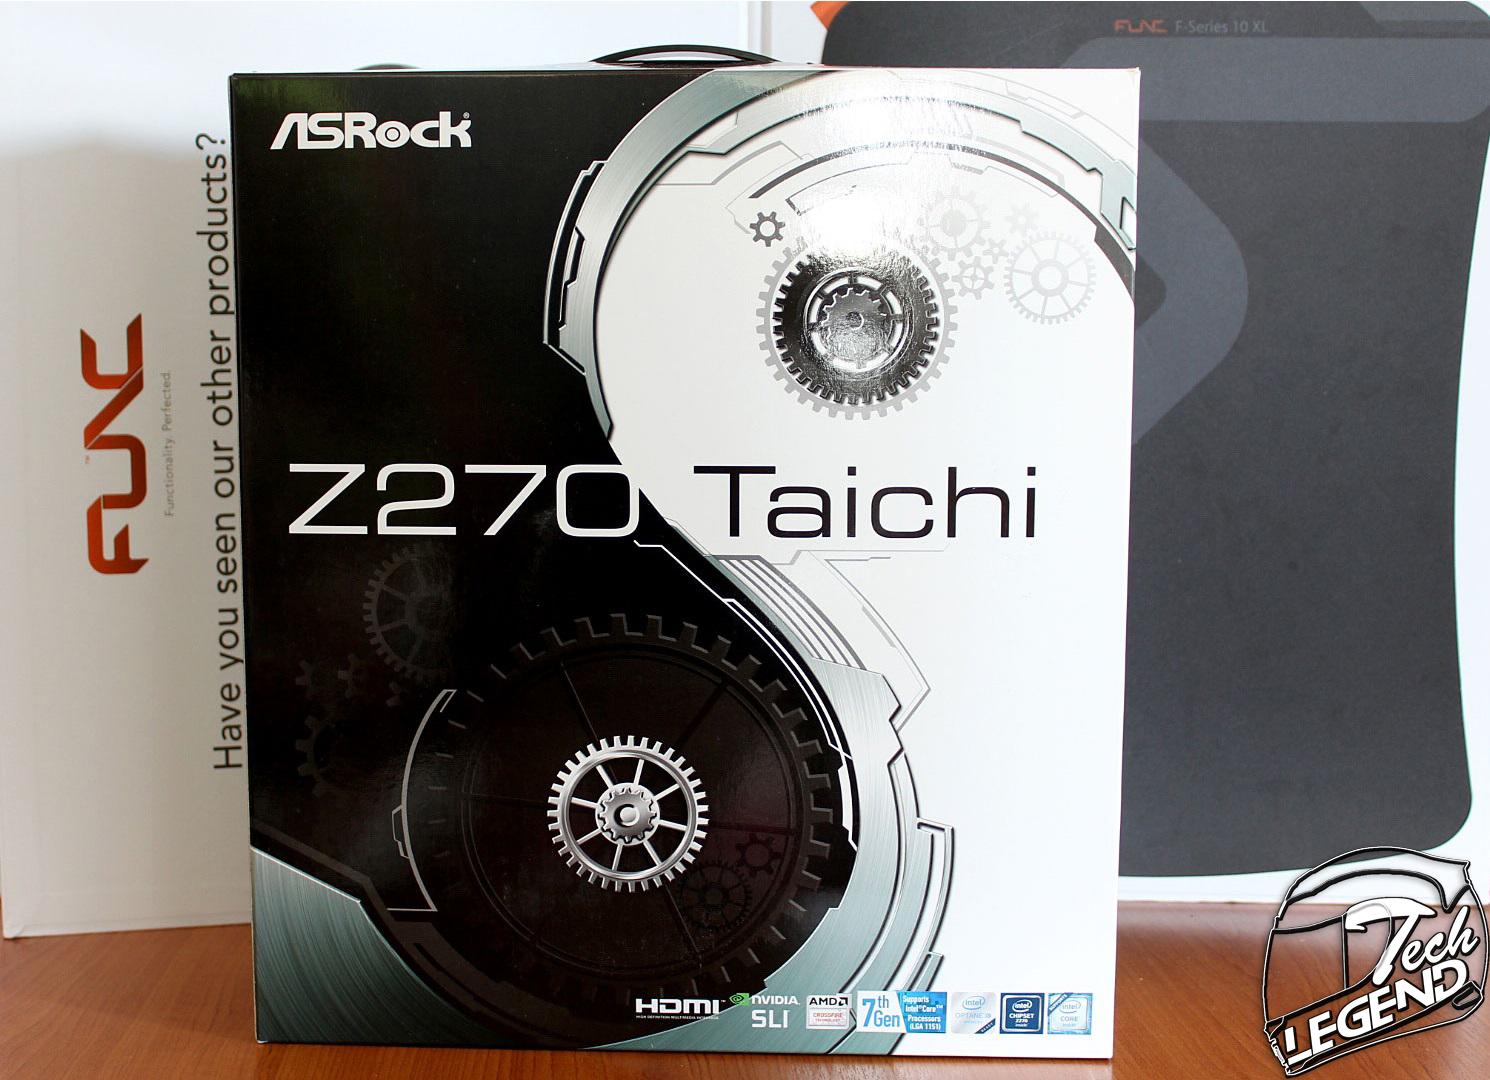 ASRock Z270 Taichi | Motherboard Review